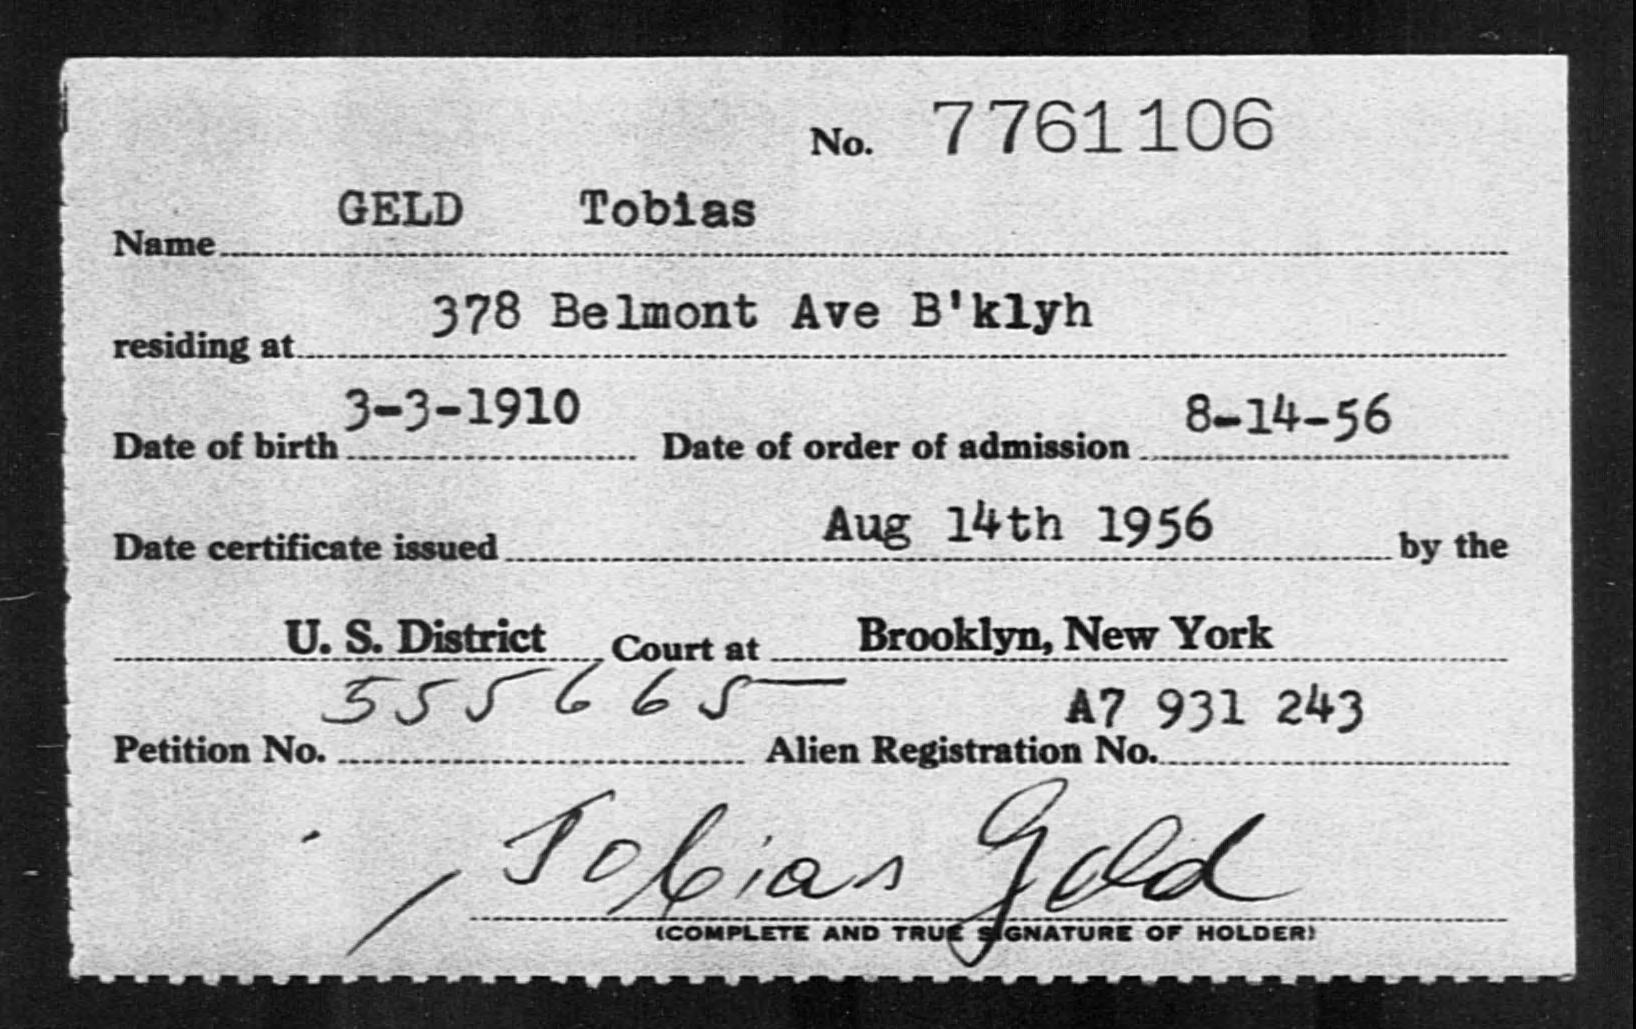 GELD Tobias - Born: 1910, Naturalized: 1956